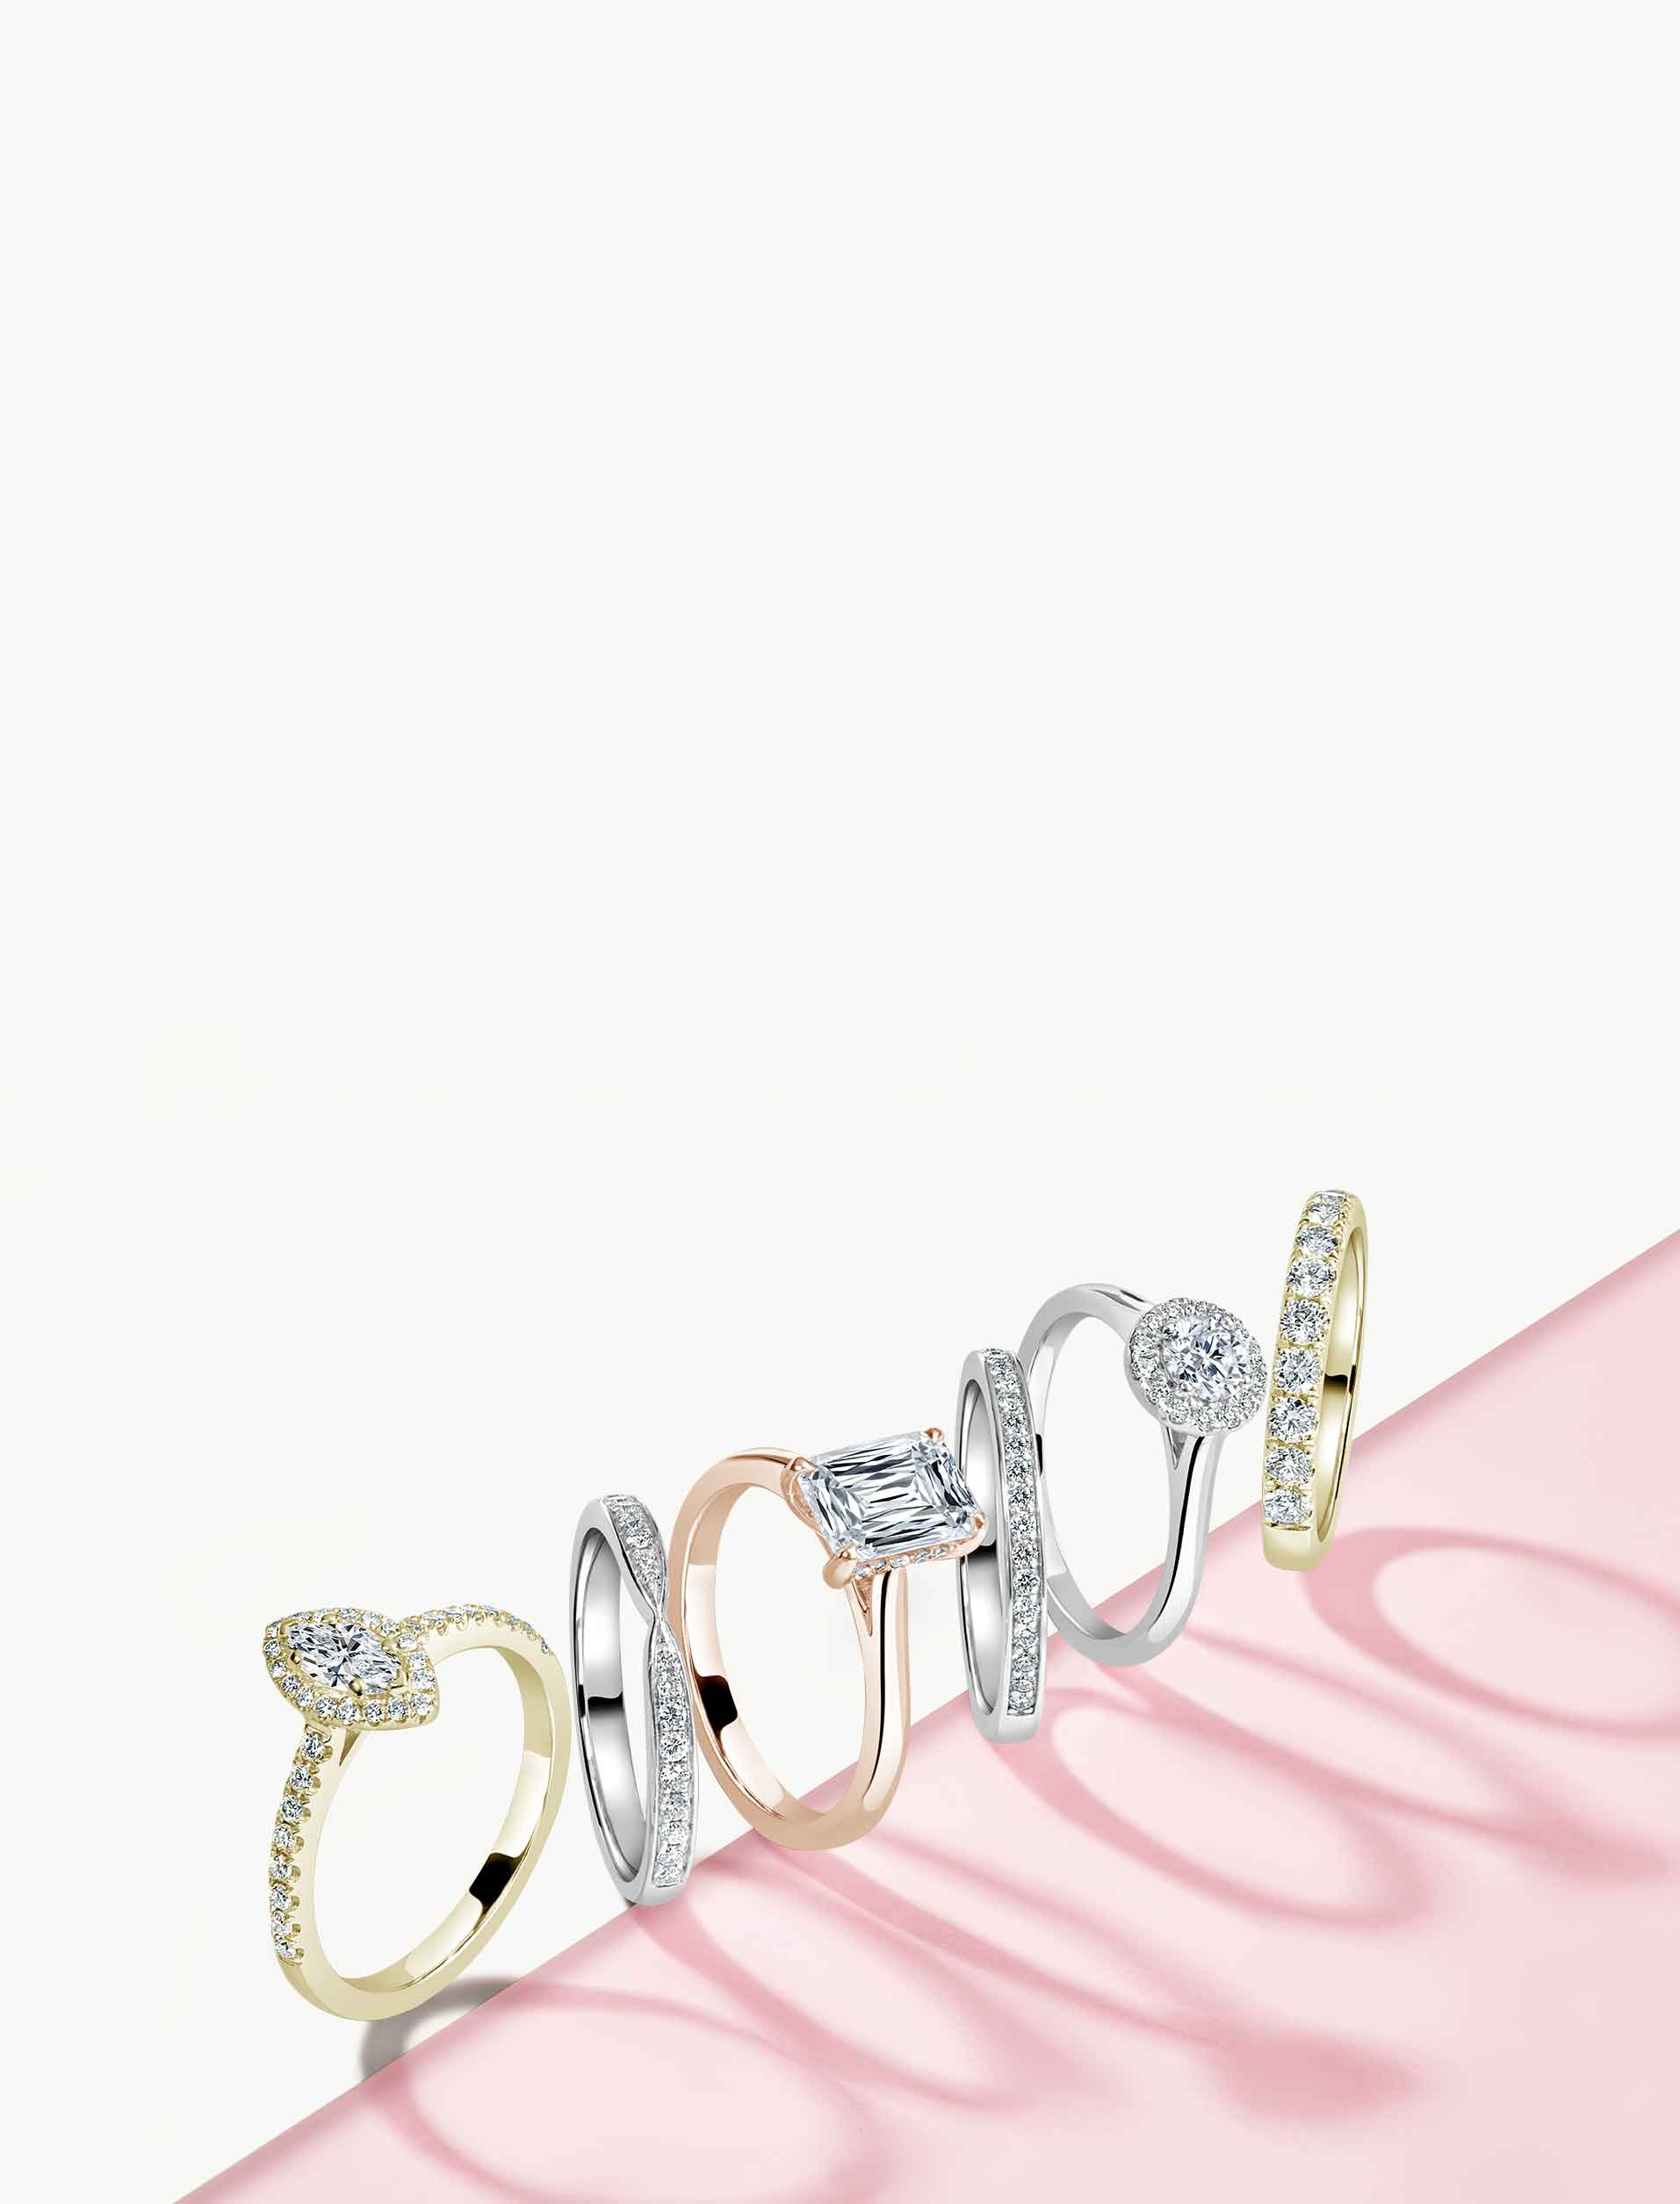 Princess Cut Three Stone Engagement Rings - Steven Stone